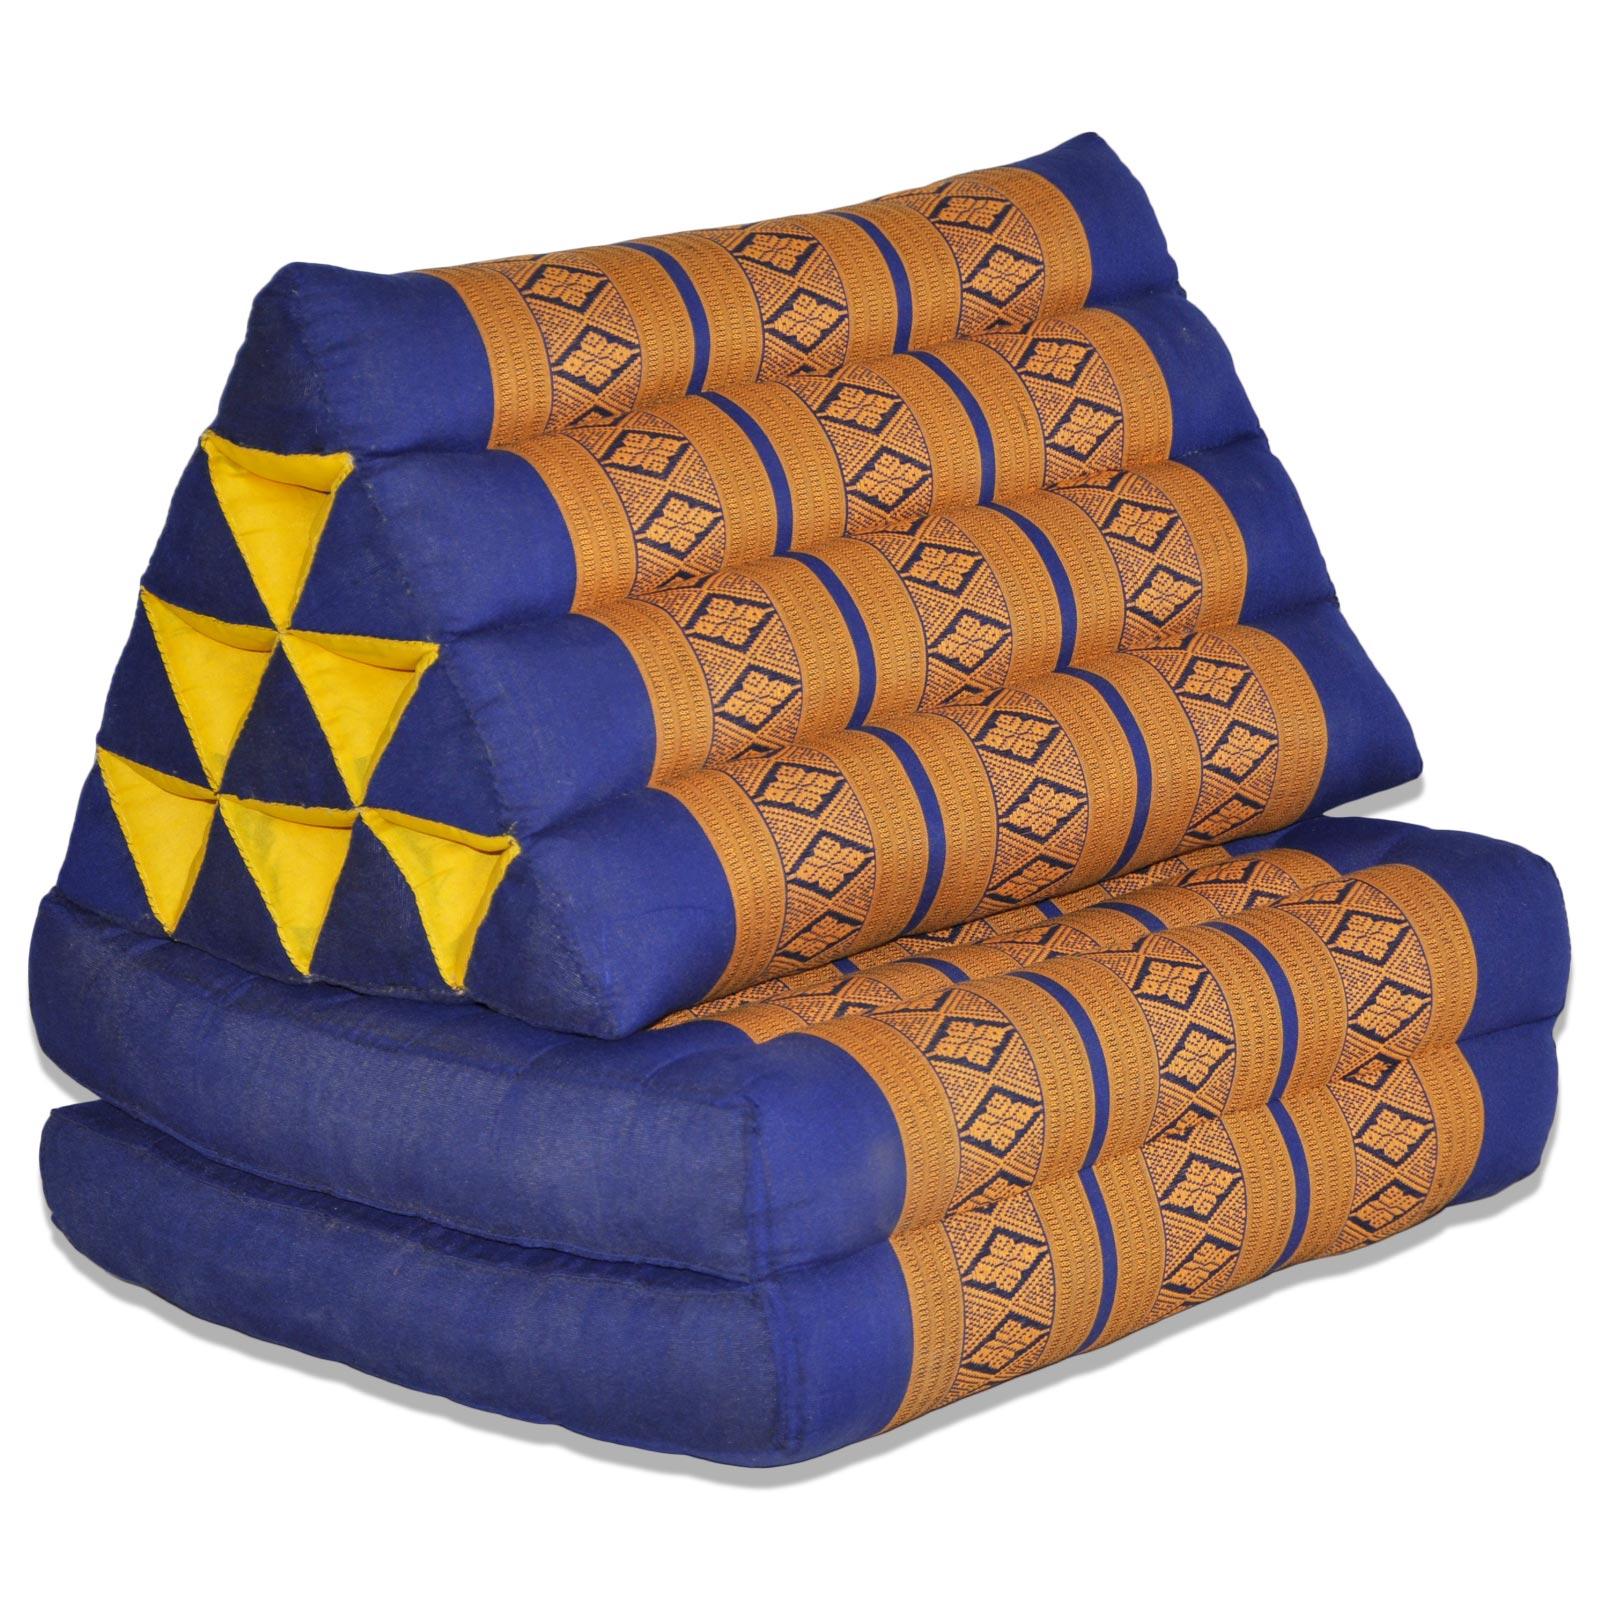 coussin triangle assise 2 plis bleu jaune. Black Bedroom Furniture Sets. Home Design Ideas